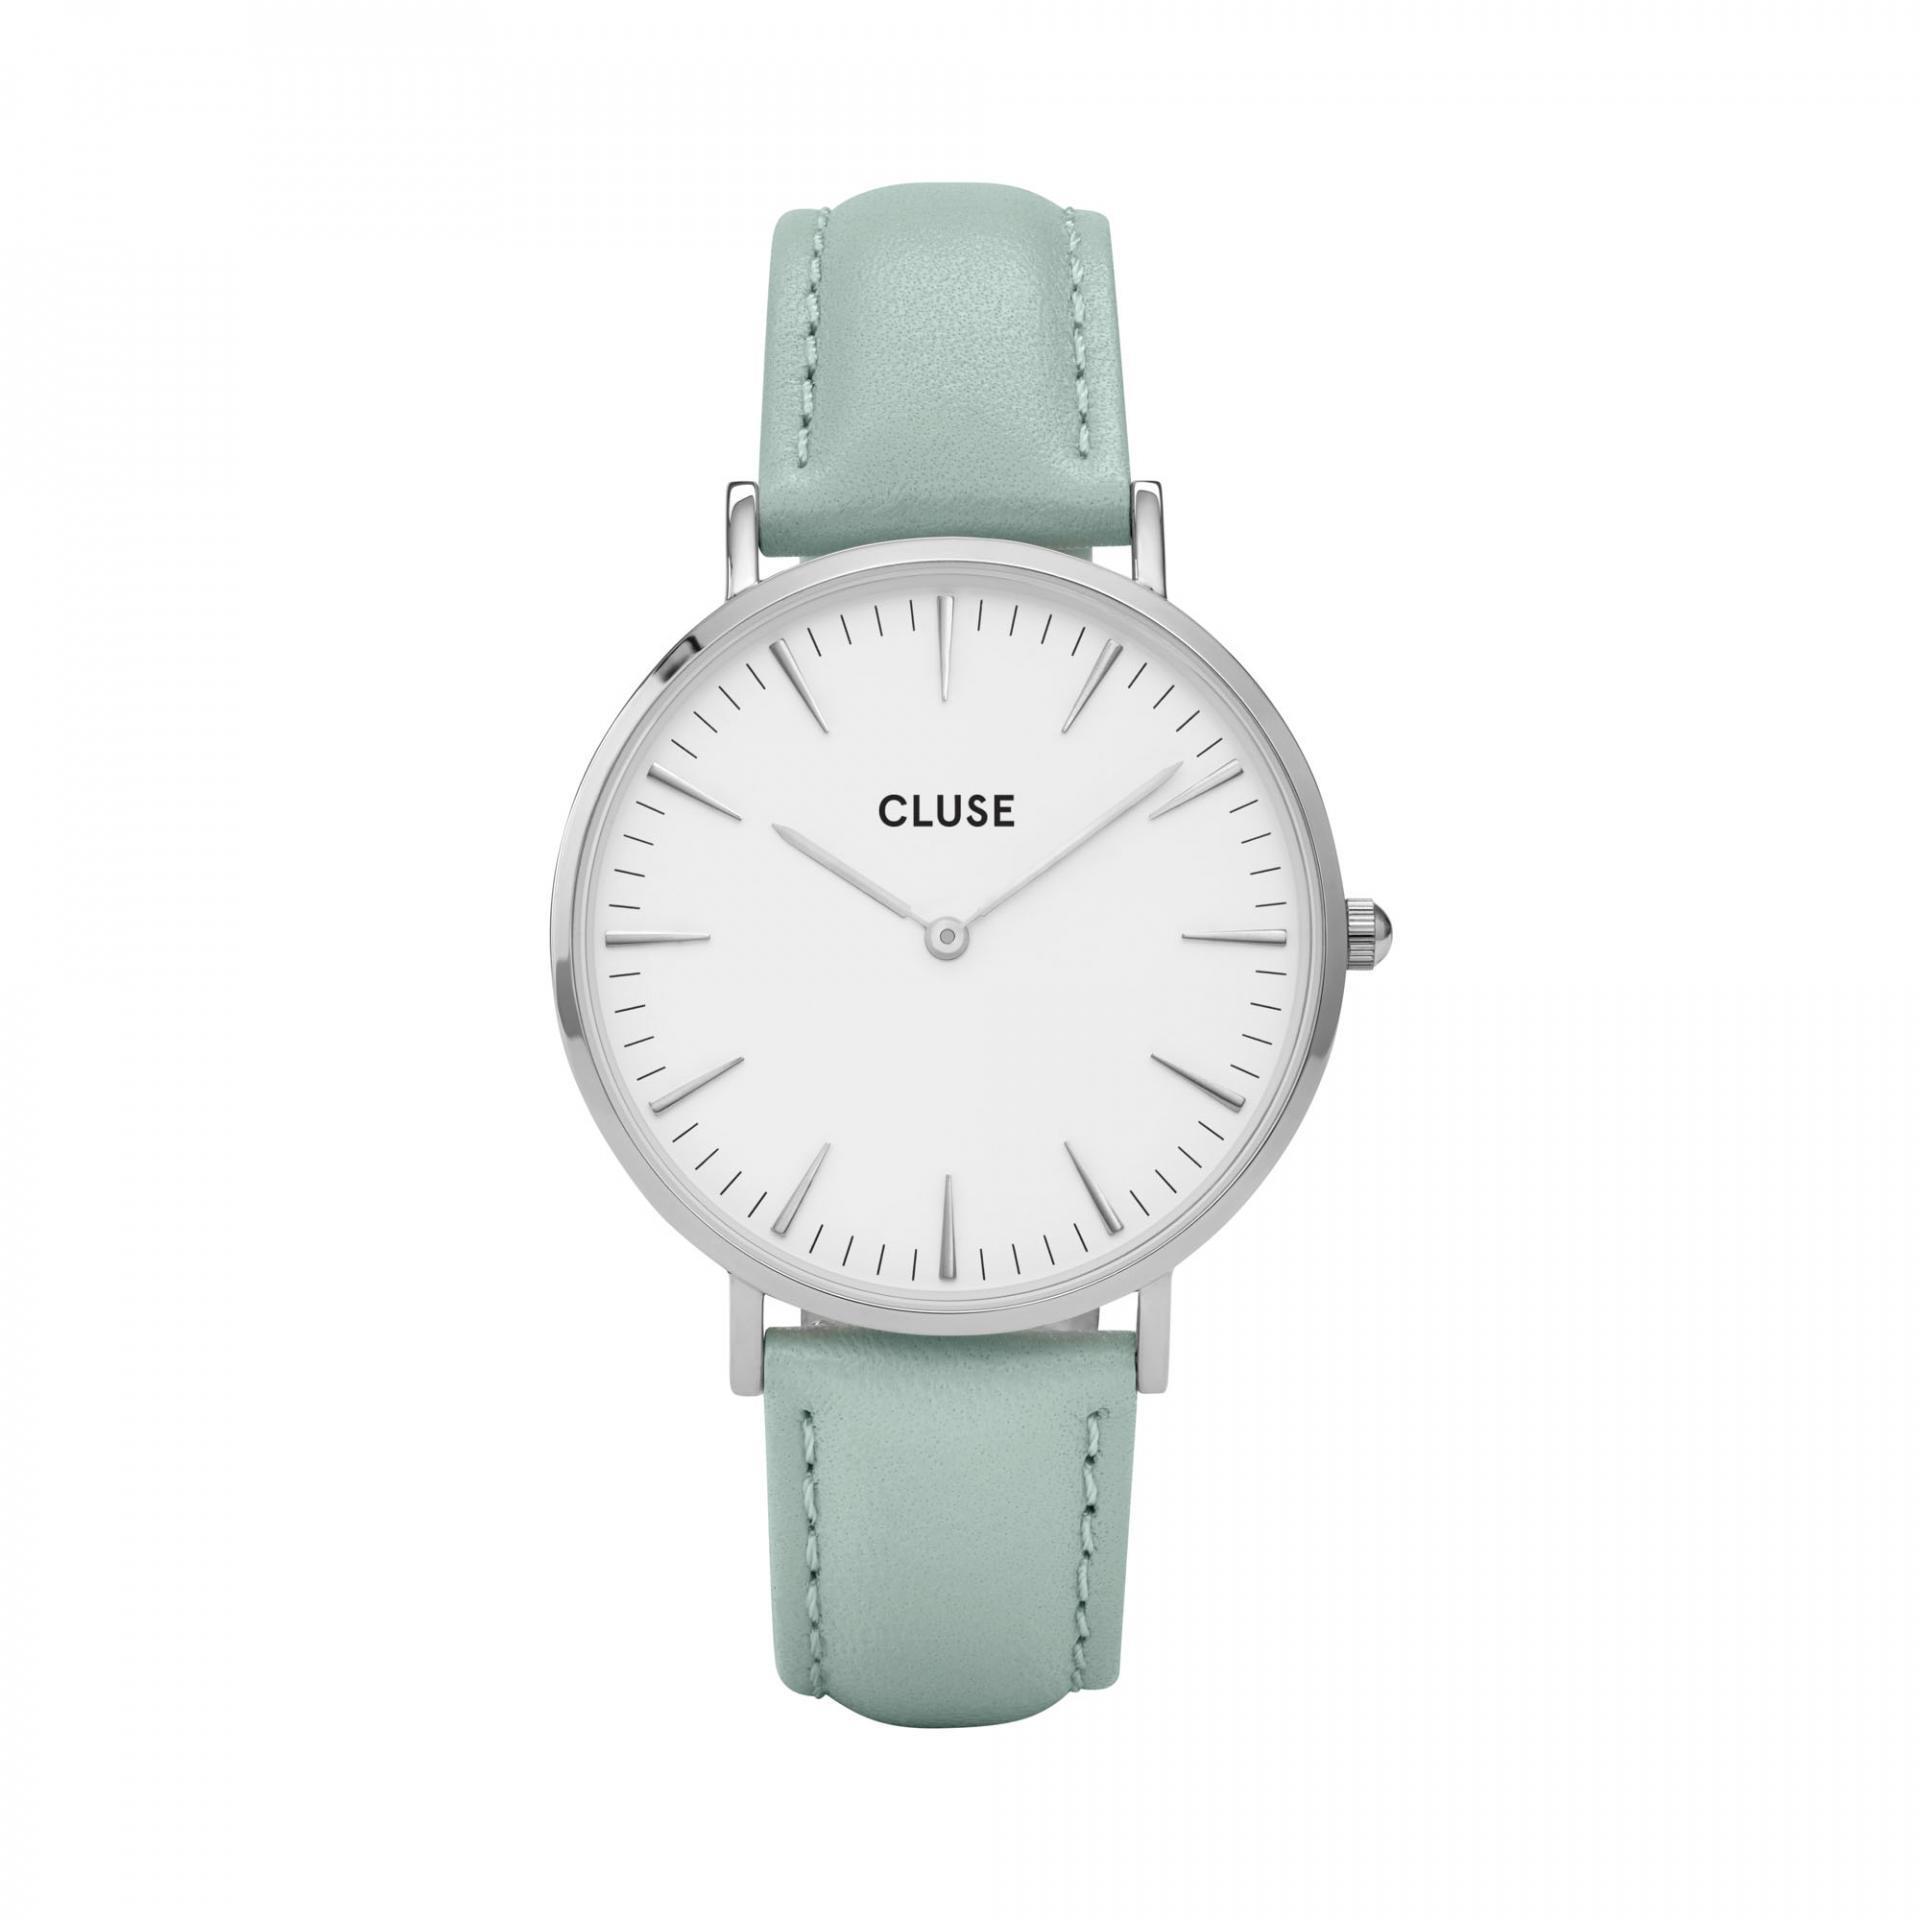 CLUSE Hodinky Cluse La Bohéme Silver white/pastel mint, modrá barva, zelená barva, bílá barva, sklo, kov, kůže